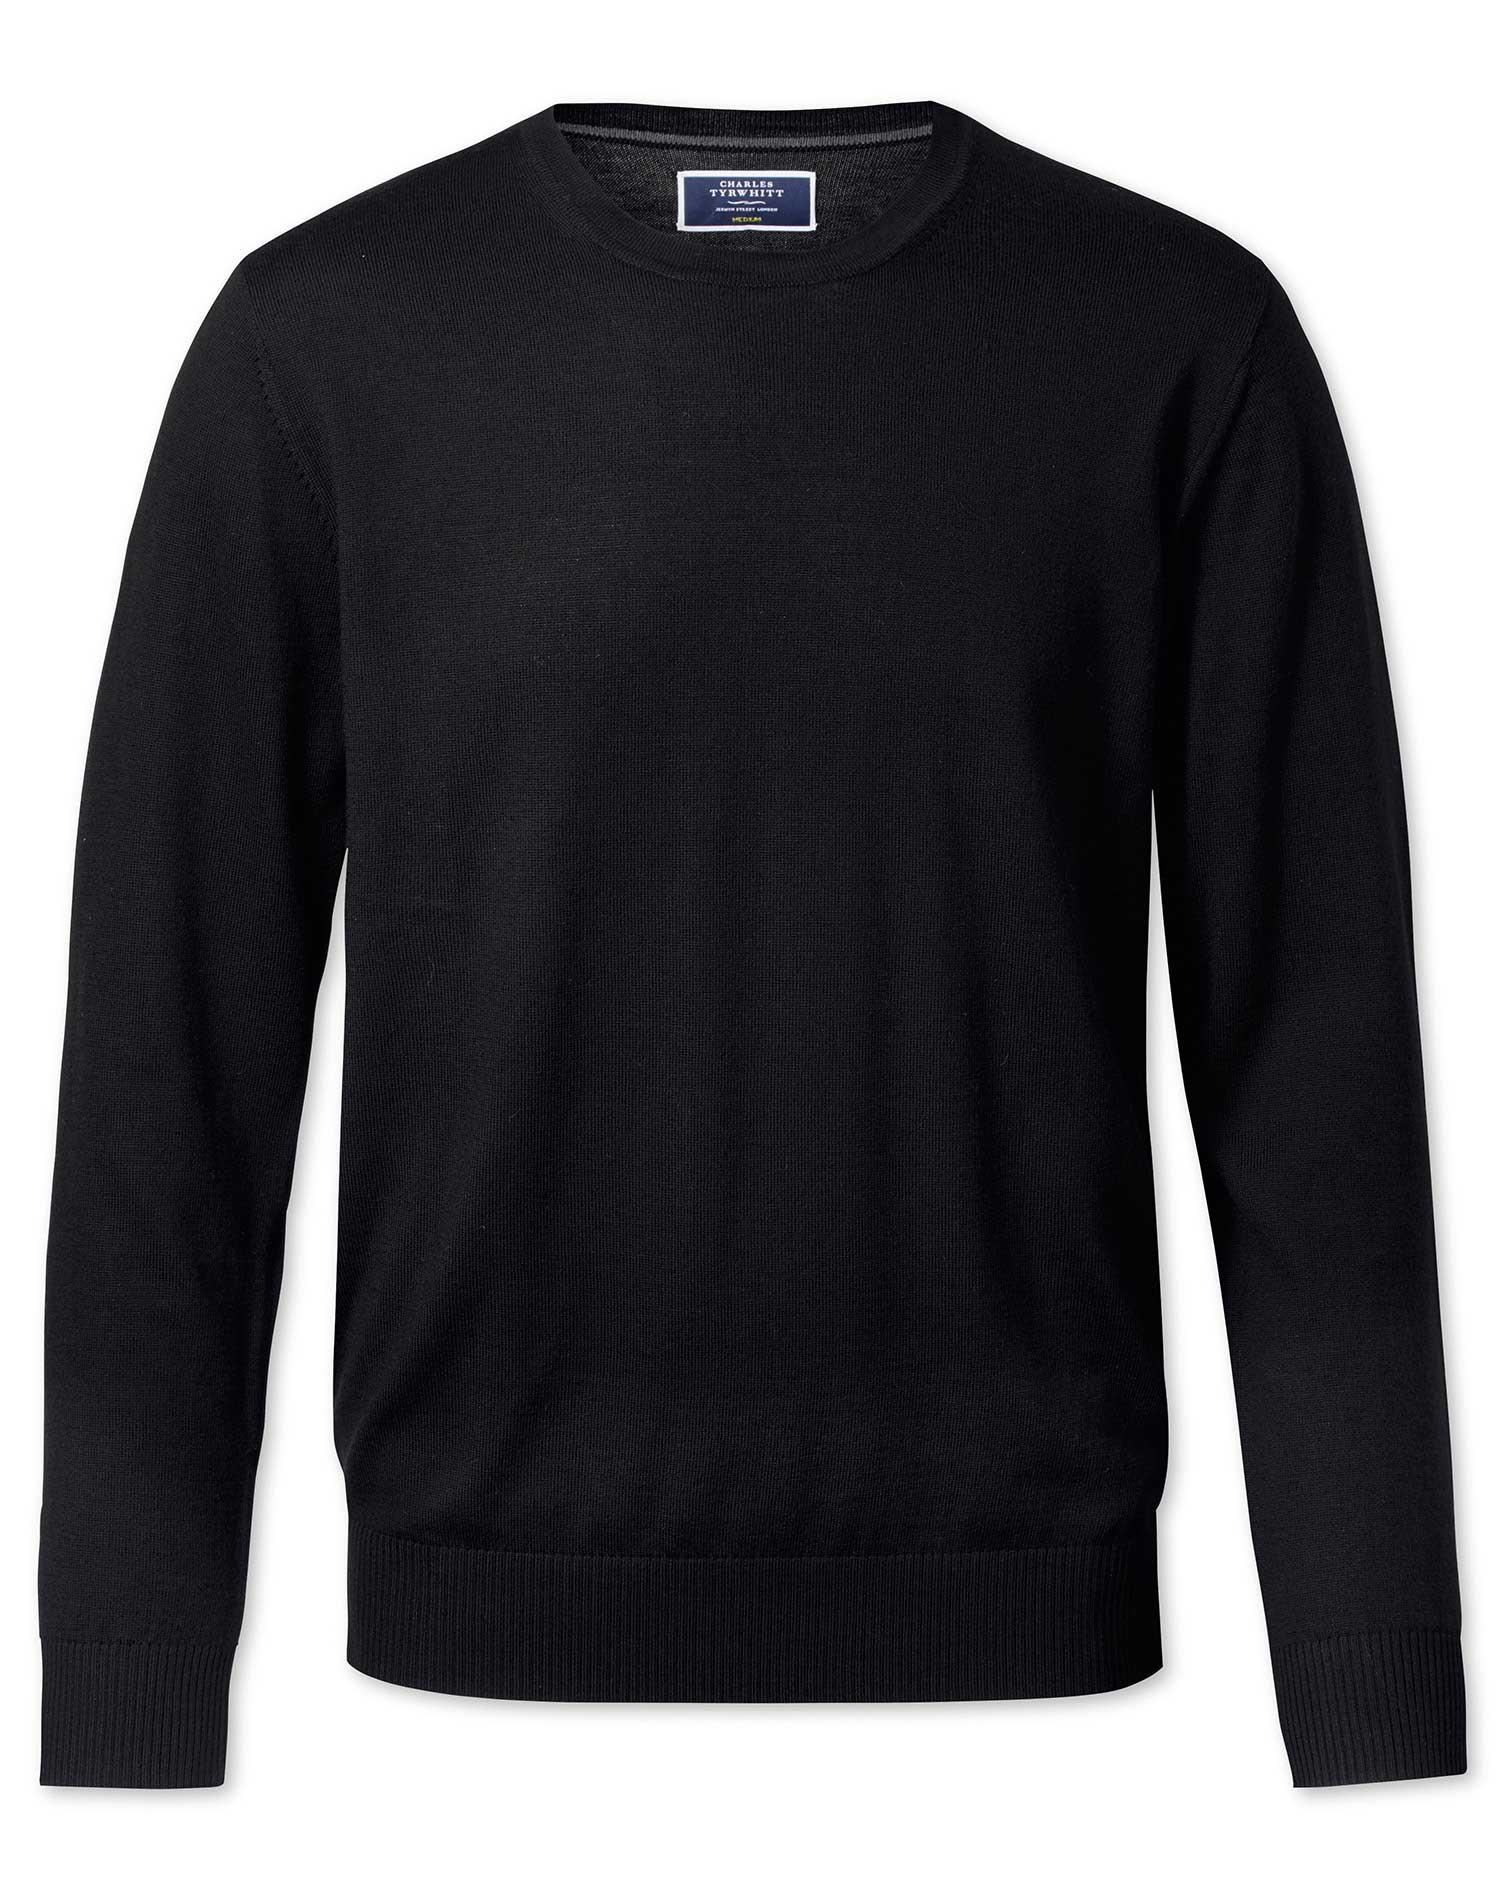 Black Merino Wool Crew Neck Jumper Size XXXL by Charles Tyrwhitt